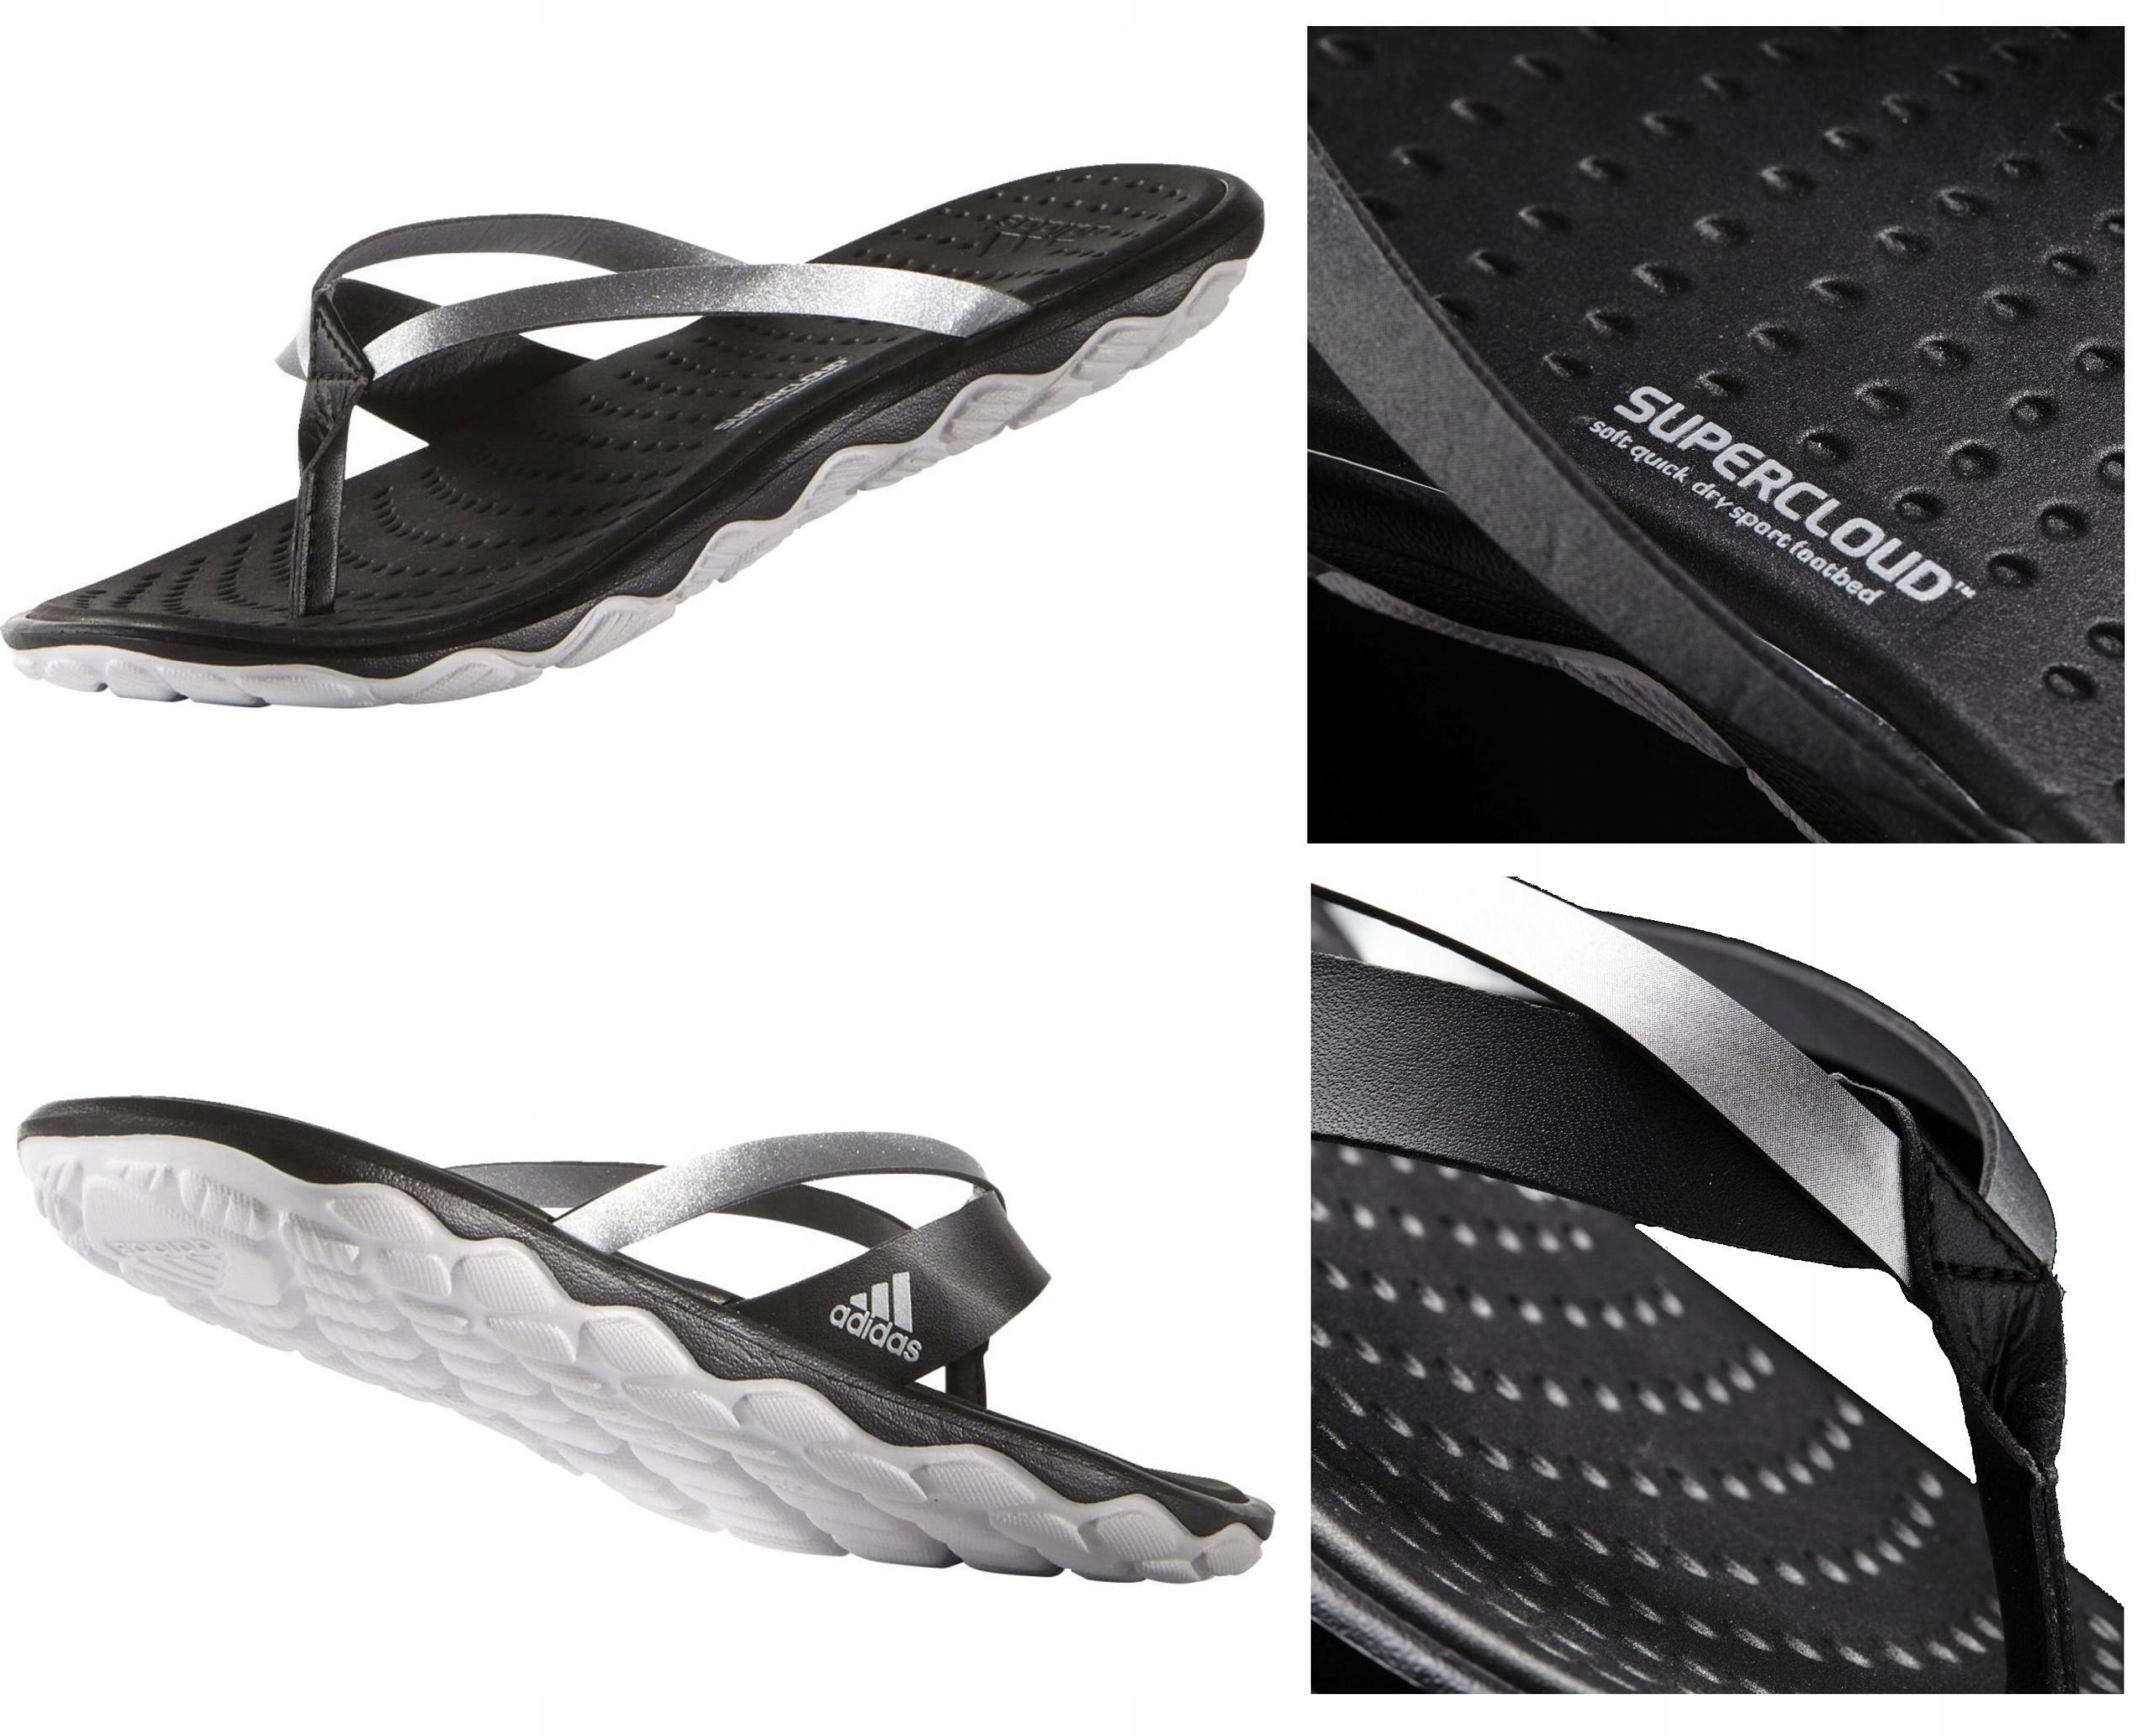 bcbdbb21b491d Adidas Borama SuperCloud Thong japonki damskie 37 - 7512753530 - oficjalne  archiwum allegro